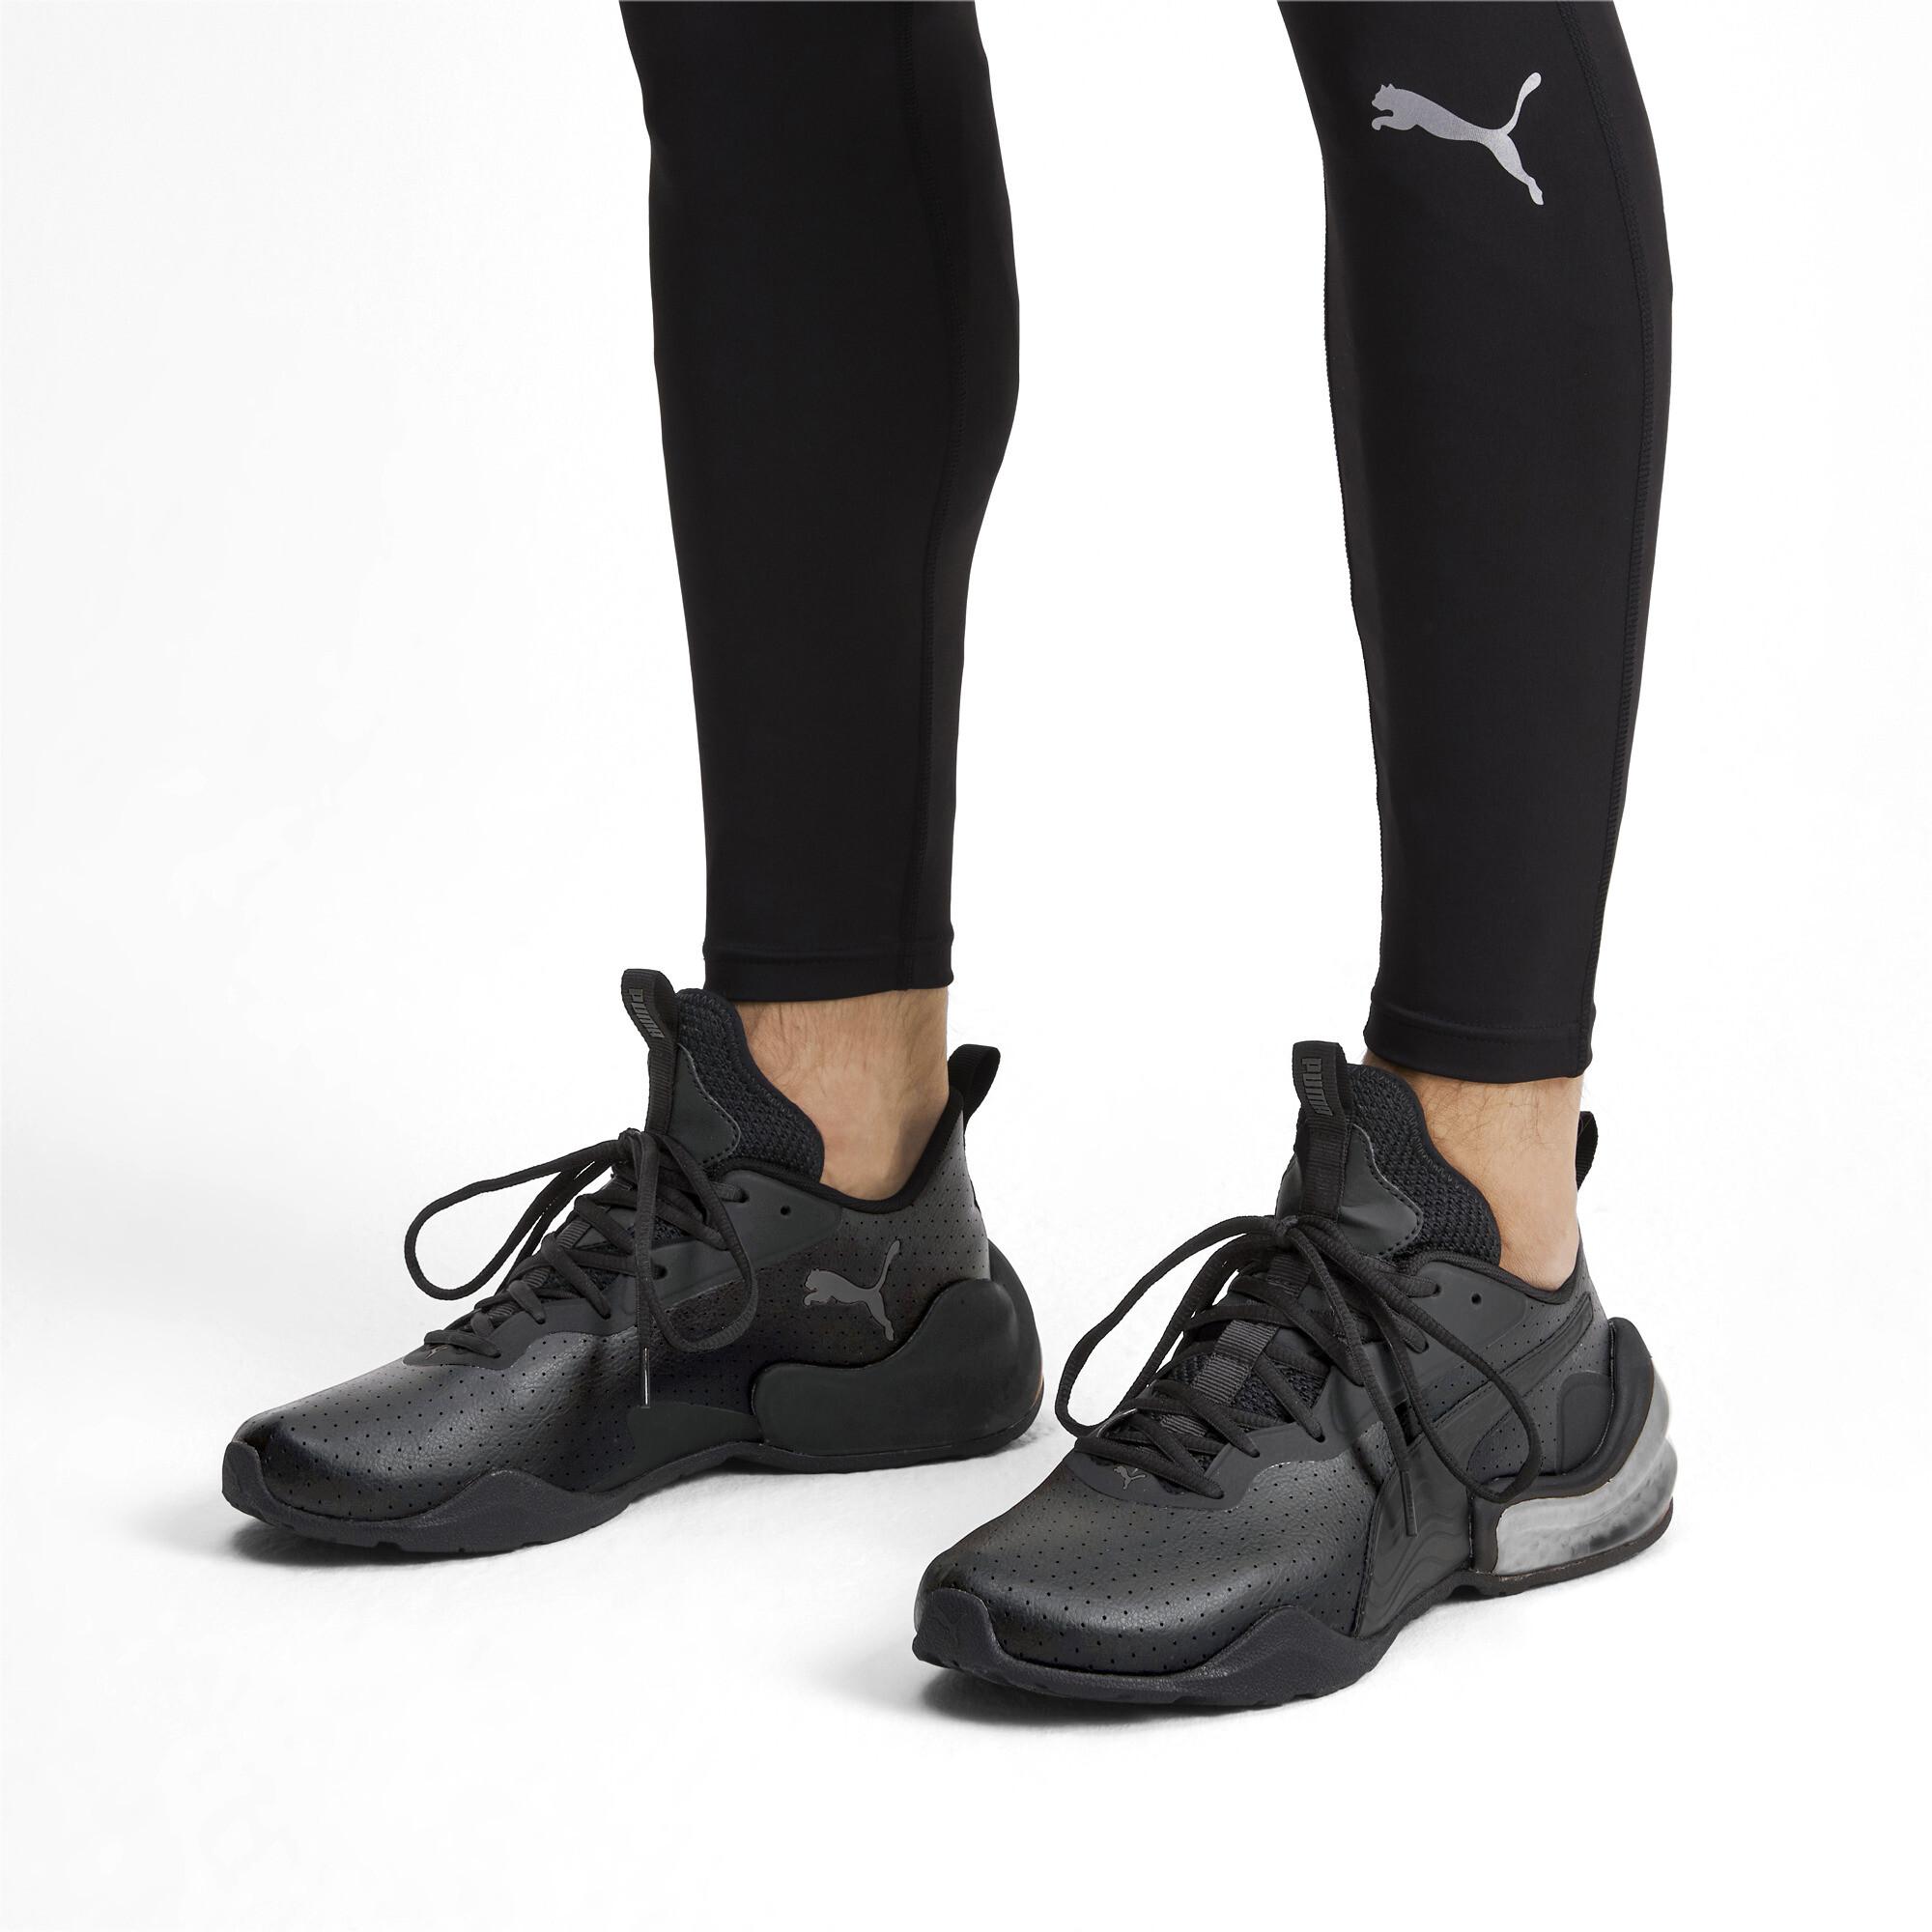 PUMA-Men-039-s-LQDCELL-Challenge-Perf-Training-Shoes thumbnail 12